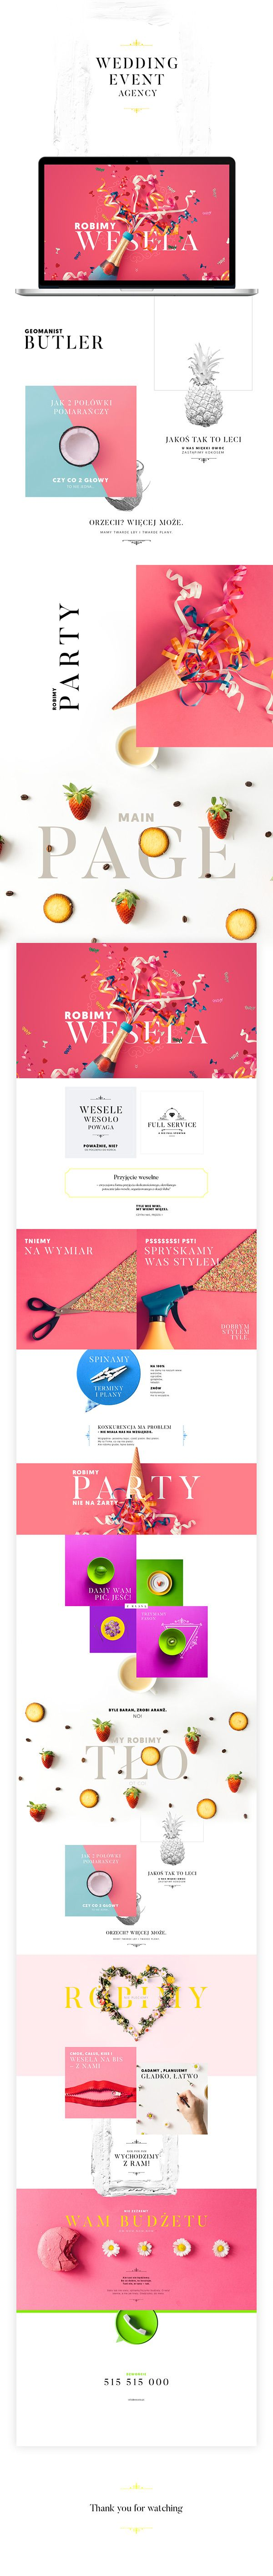 Wedding event. Web design. Website. site / tamplate.